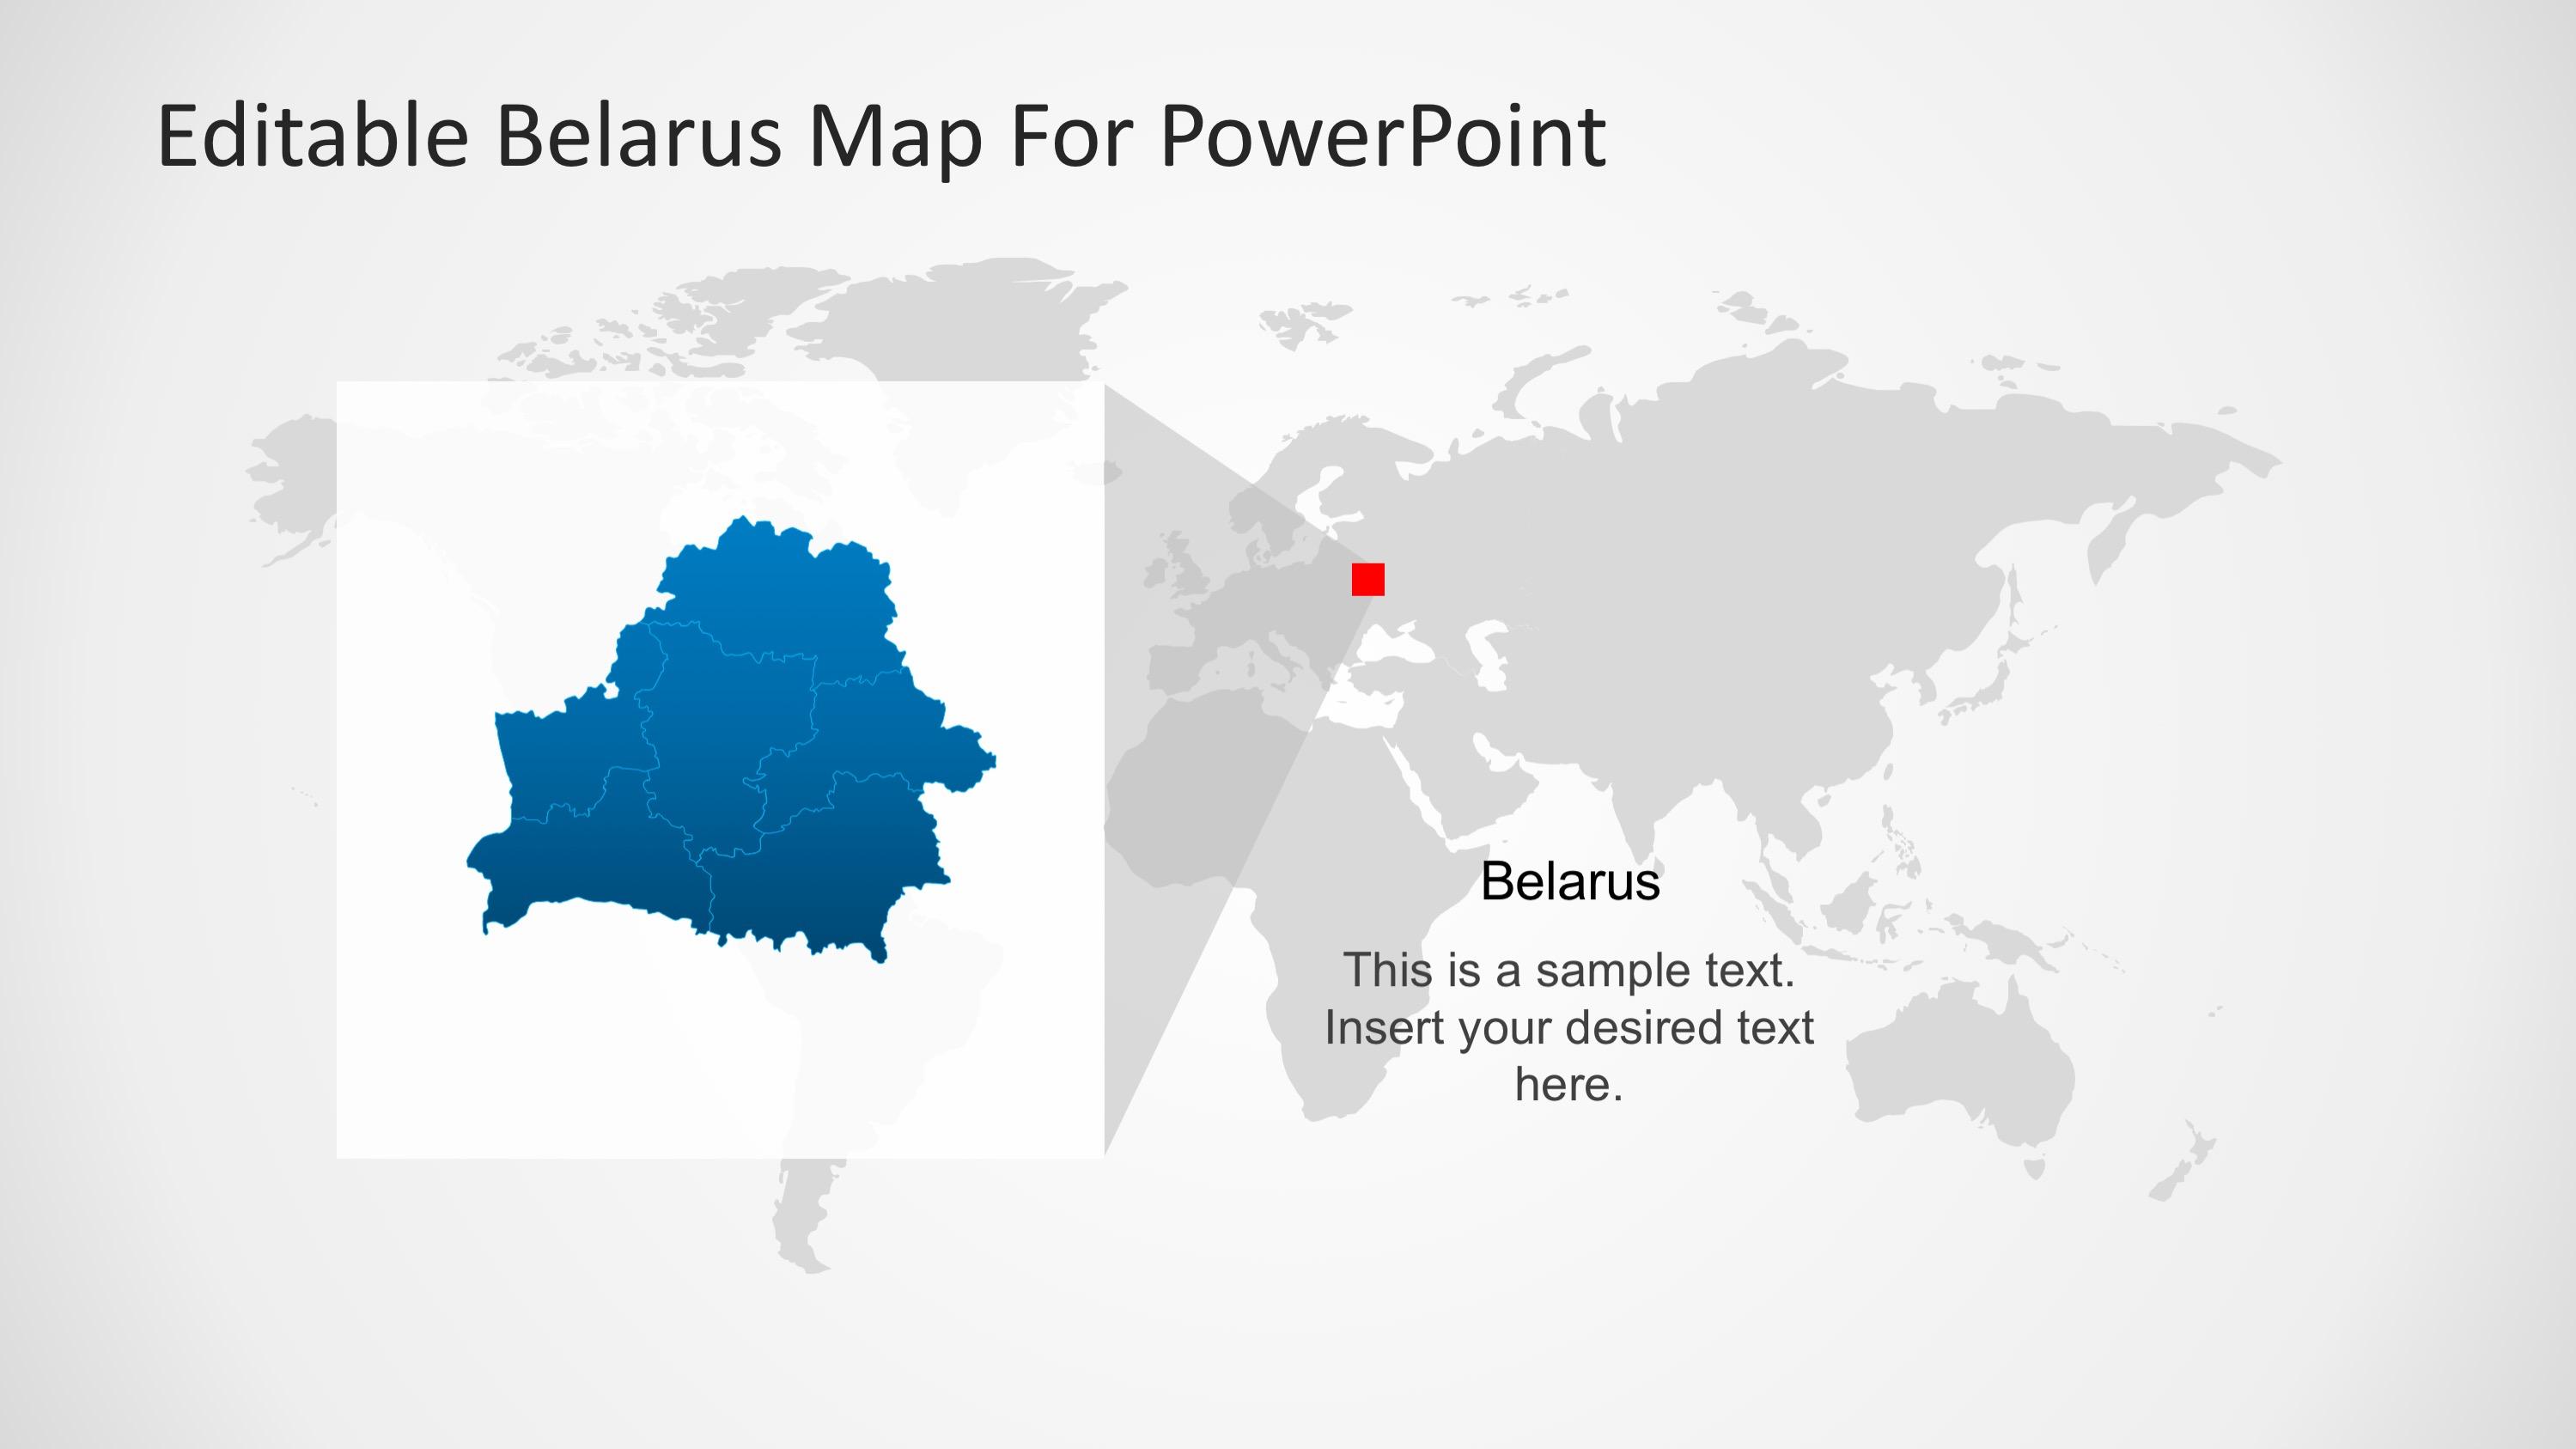 PPT Map Templates of Belarus in Worldmap